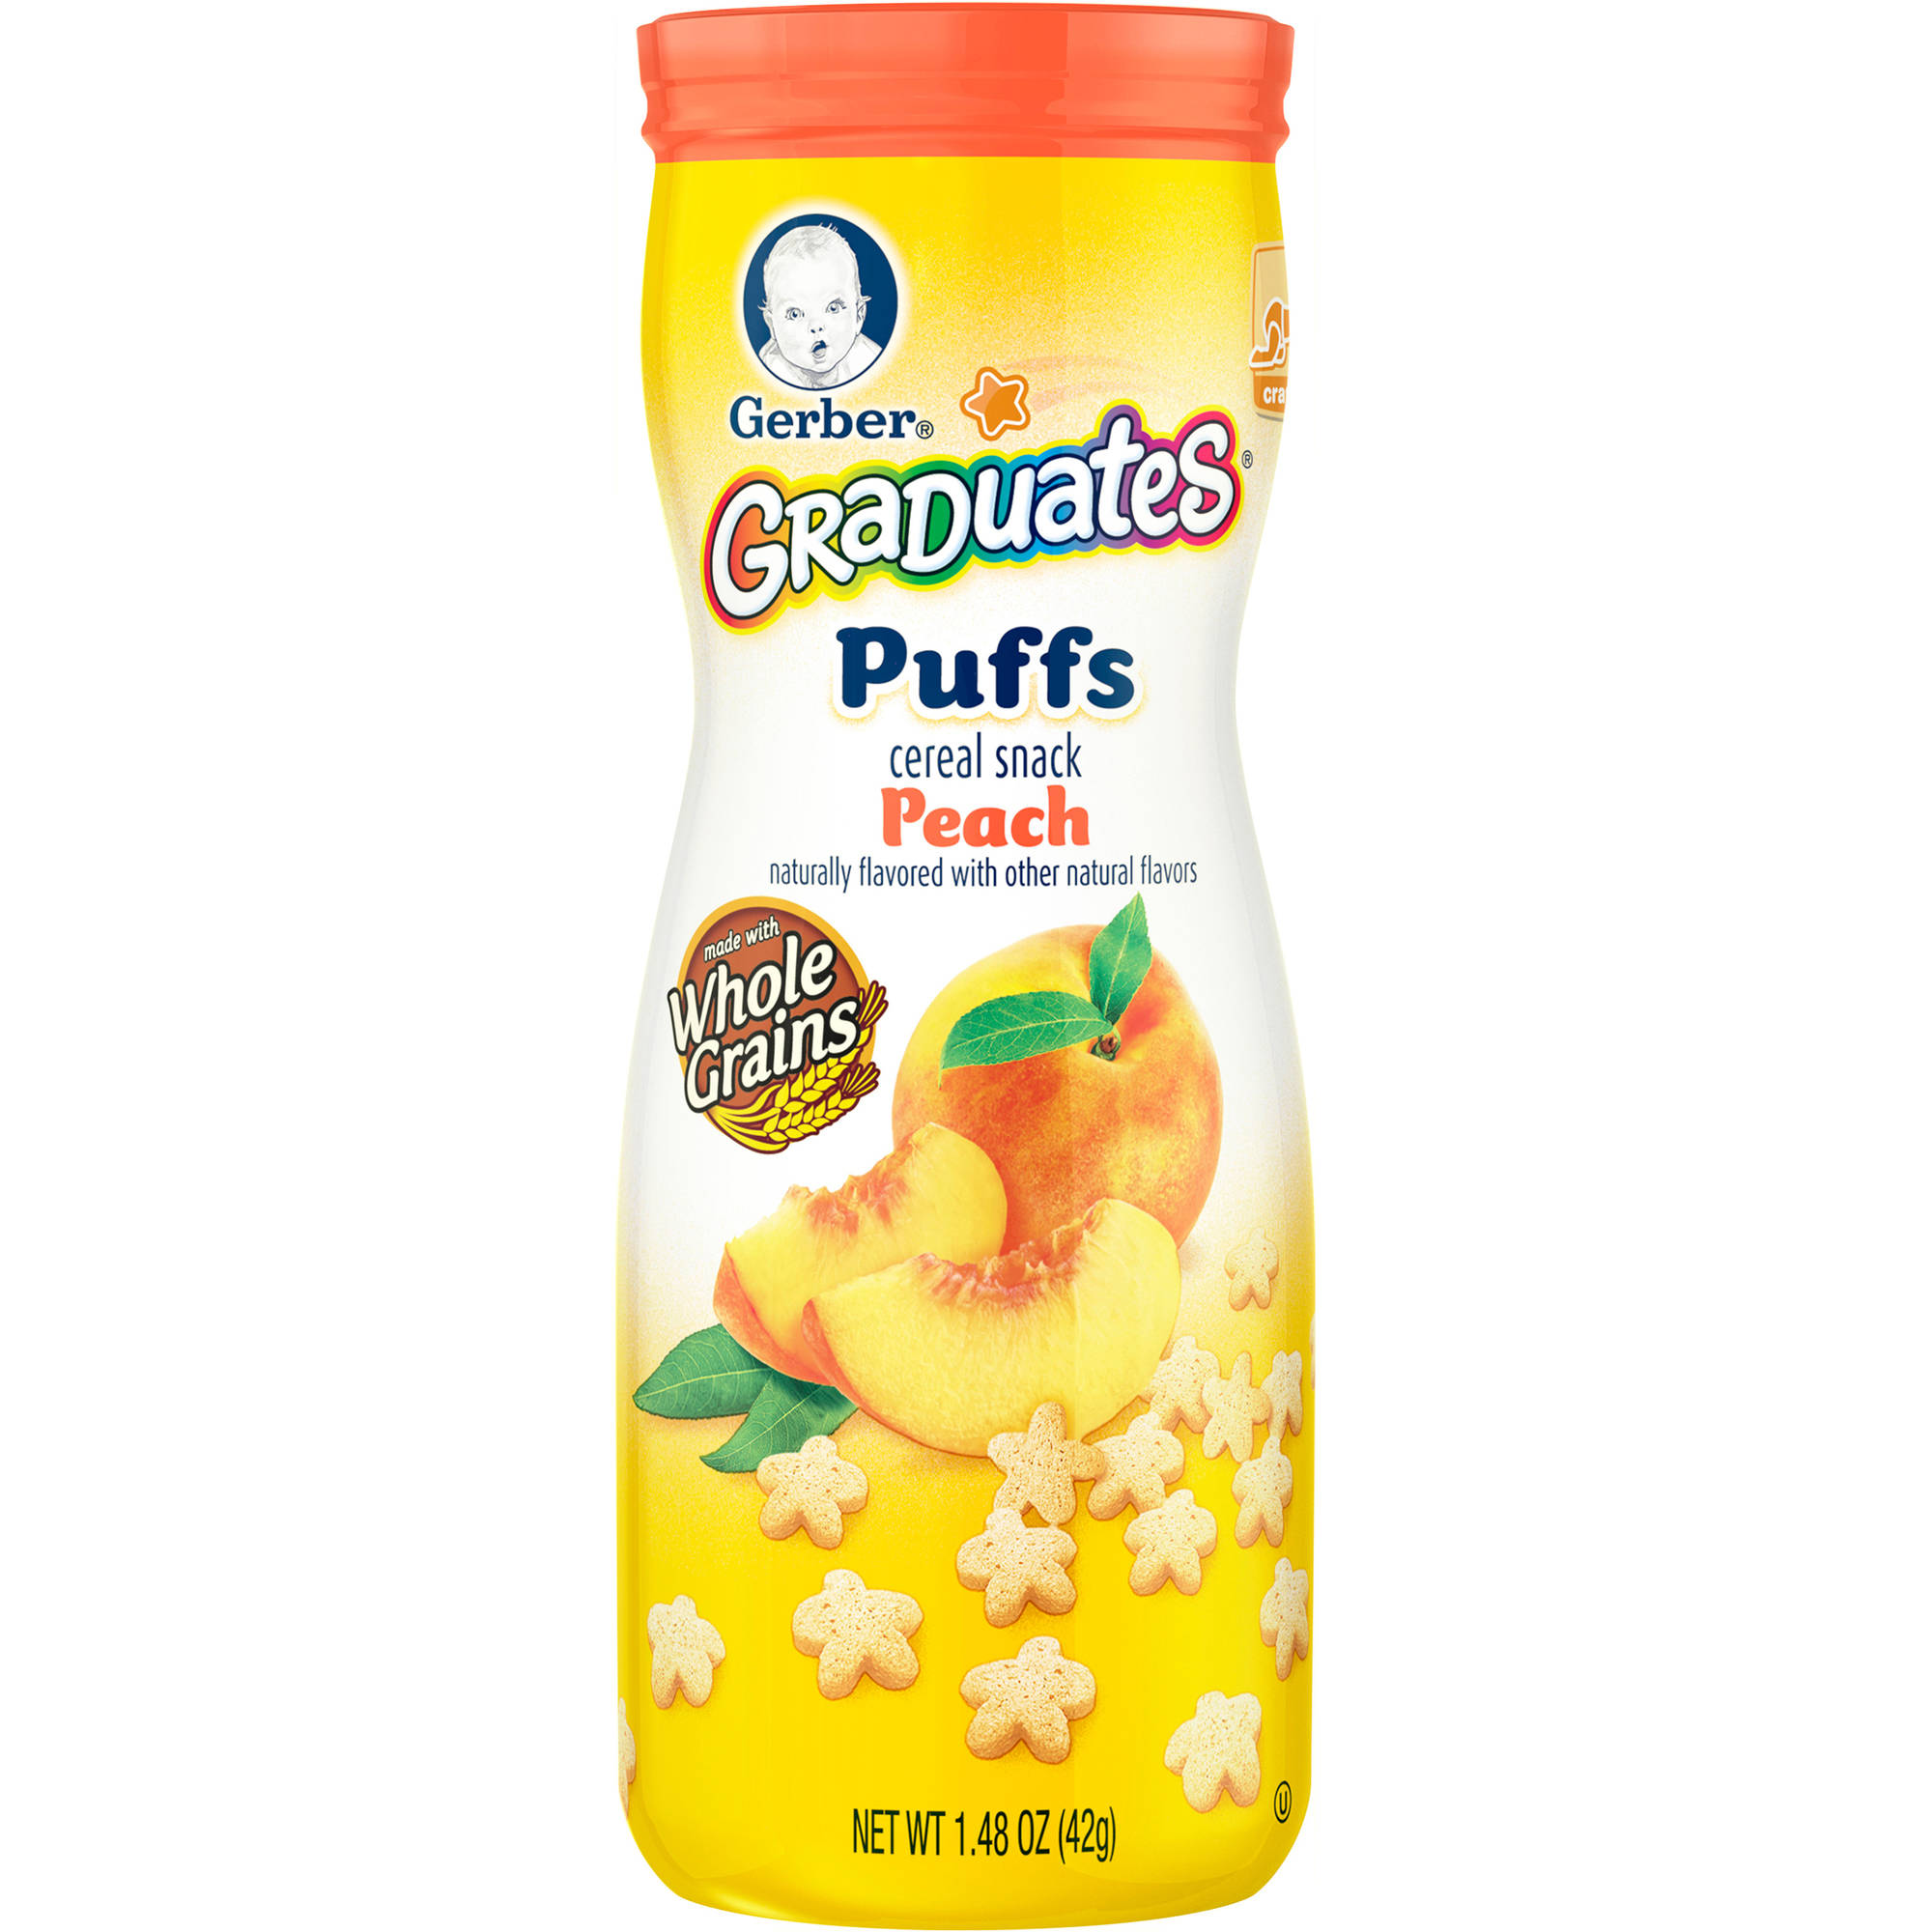 Gerber Graduates Puffs Peach Cereal Snack, 1.48 oz